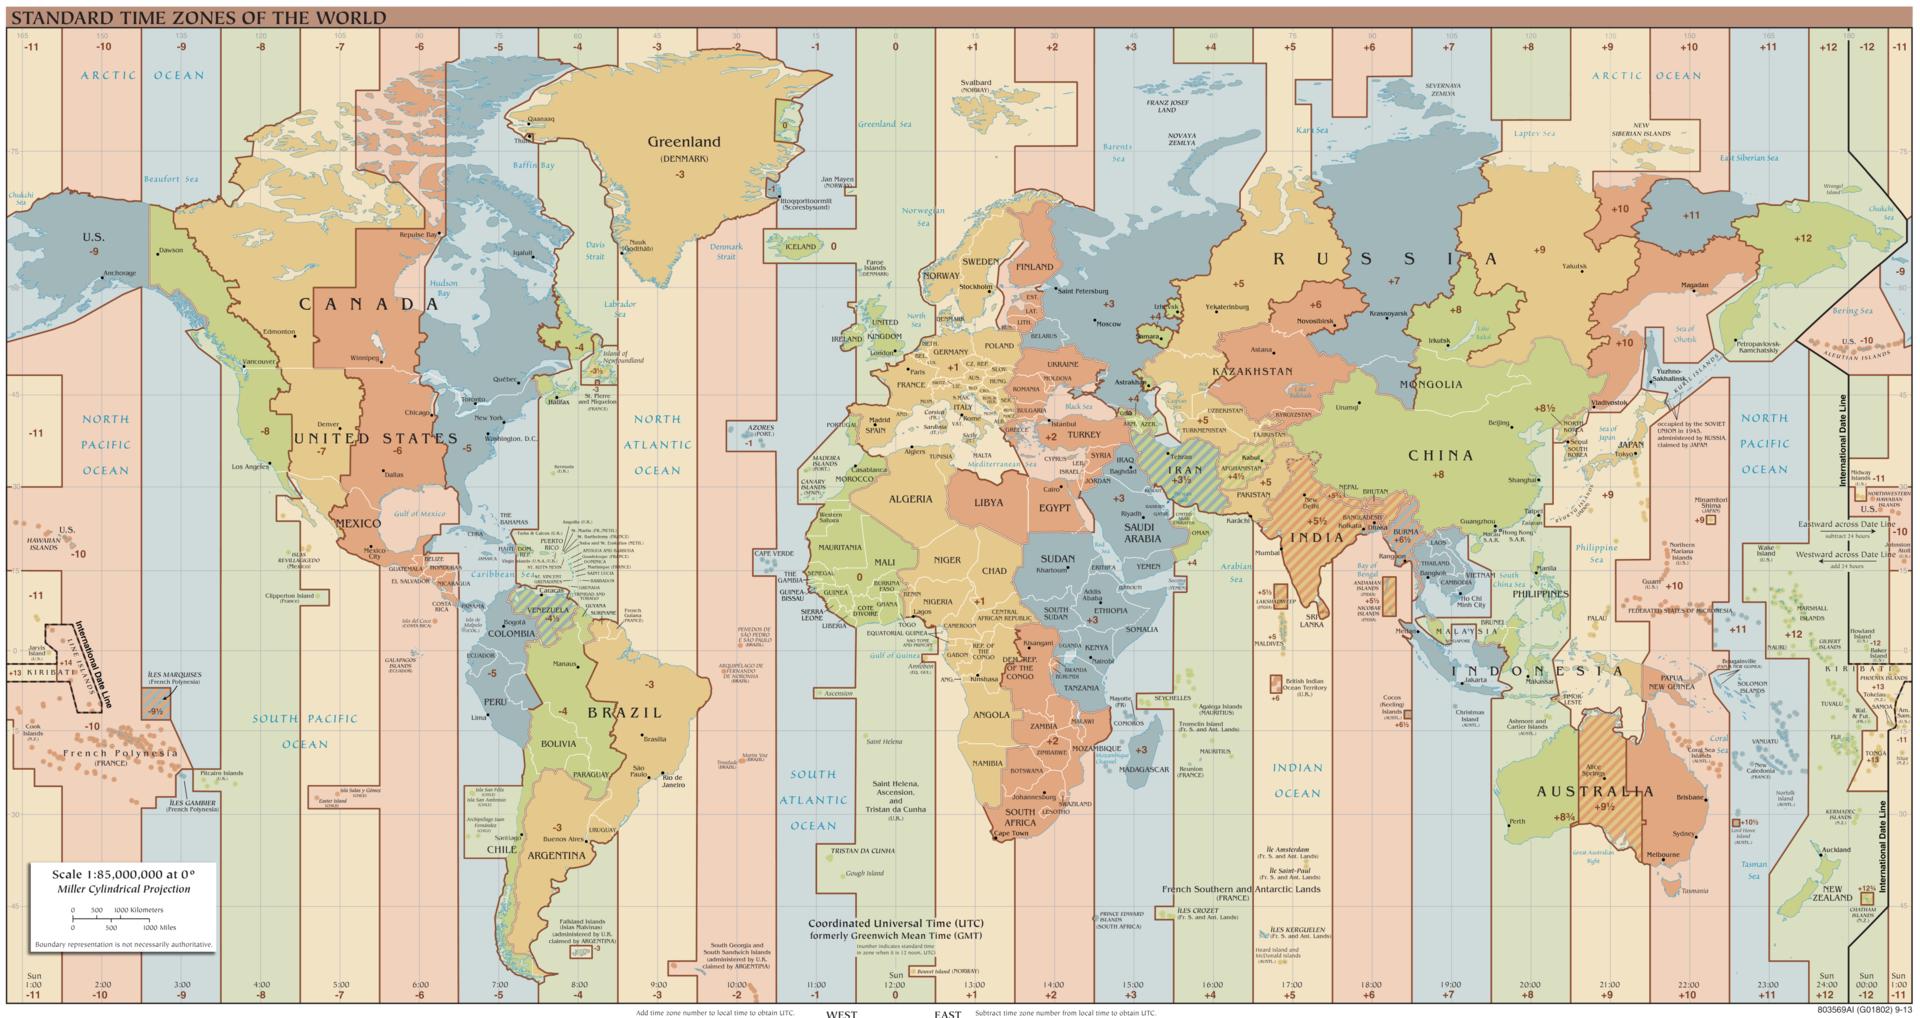 Standard_World_Time_Zones